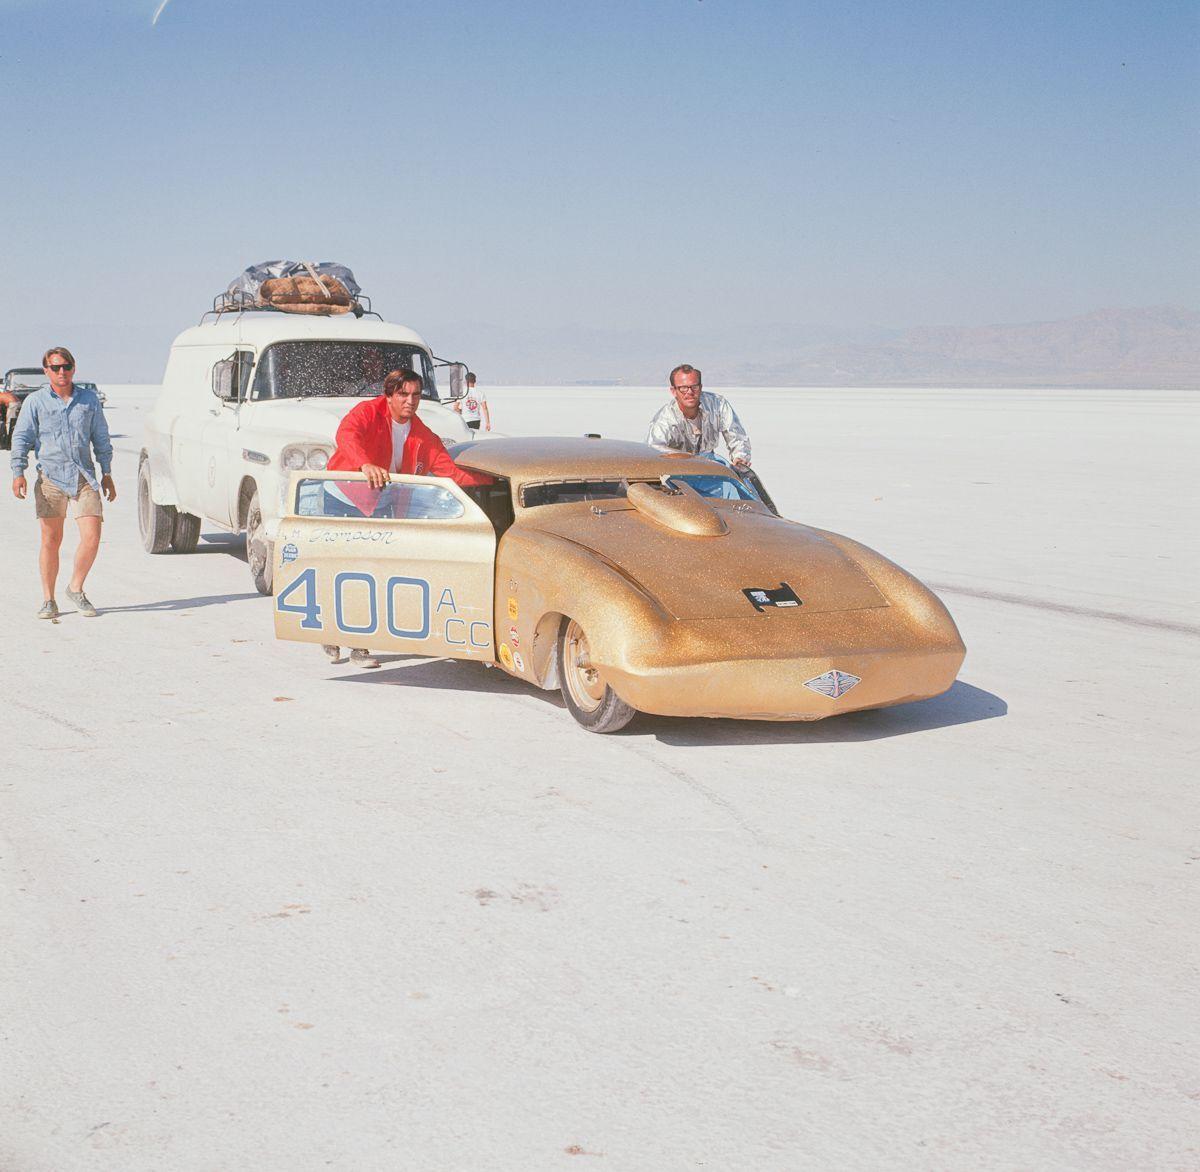 1966 blasting away speed records on the bonneville salt